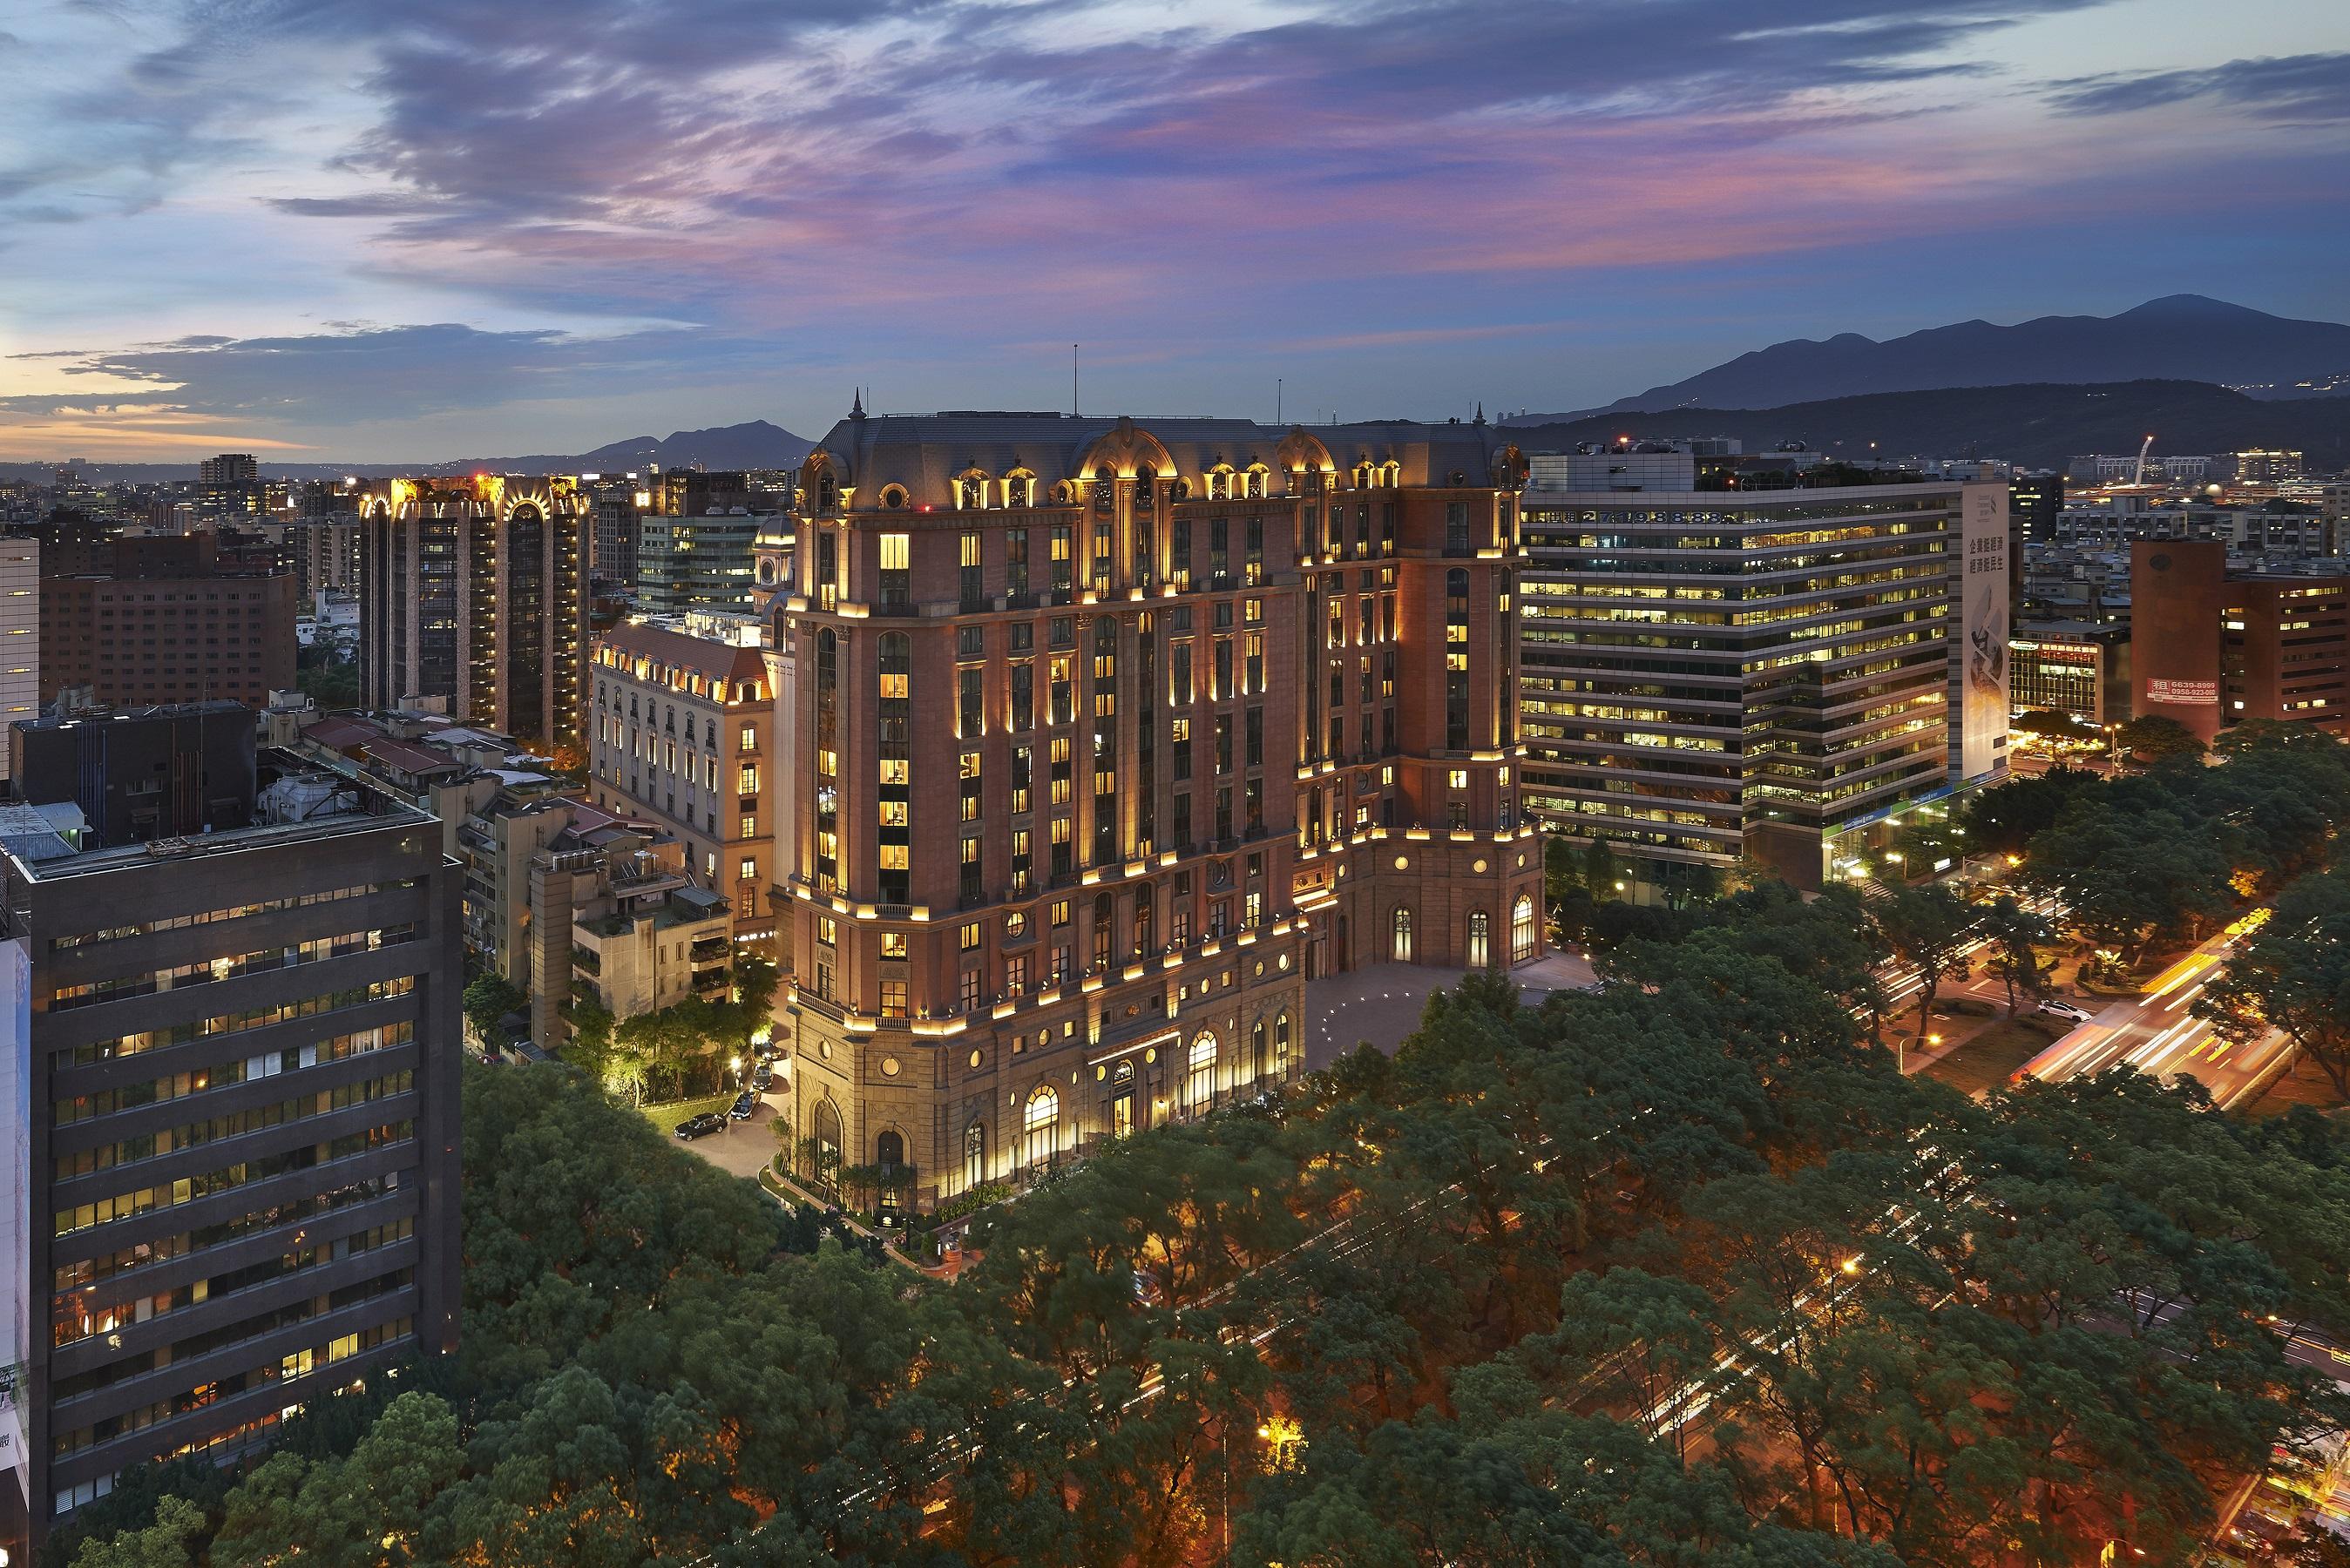 Mandarin Oriental, Taipei makes the 2015 Hotel Hot list of CN Traveler